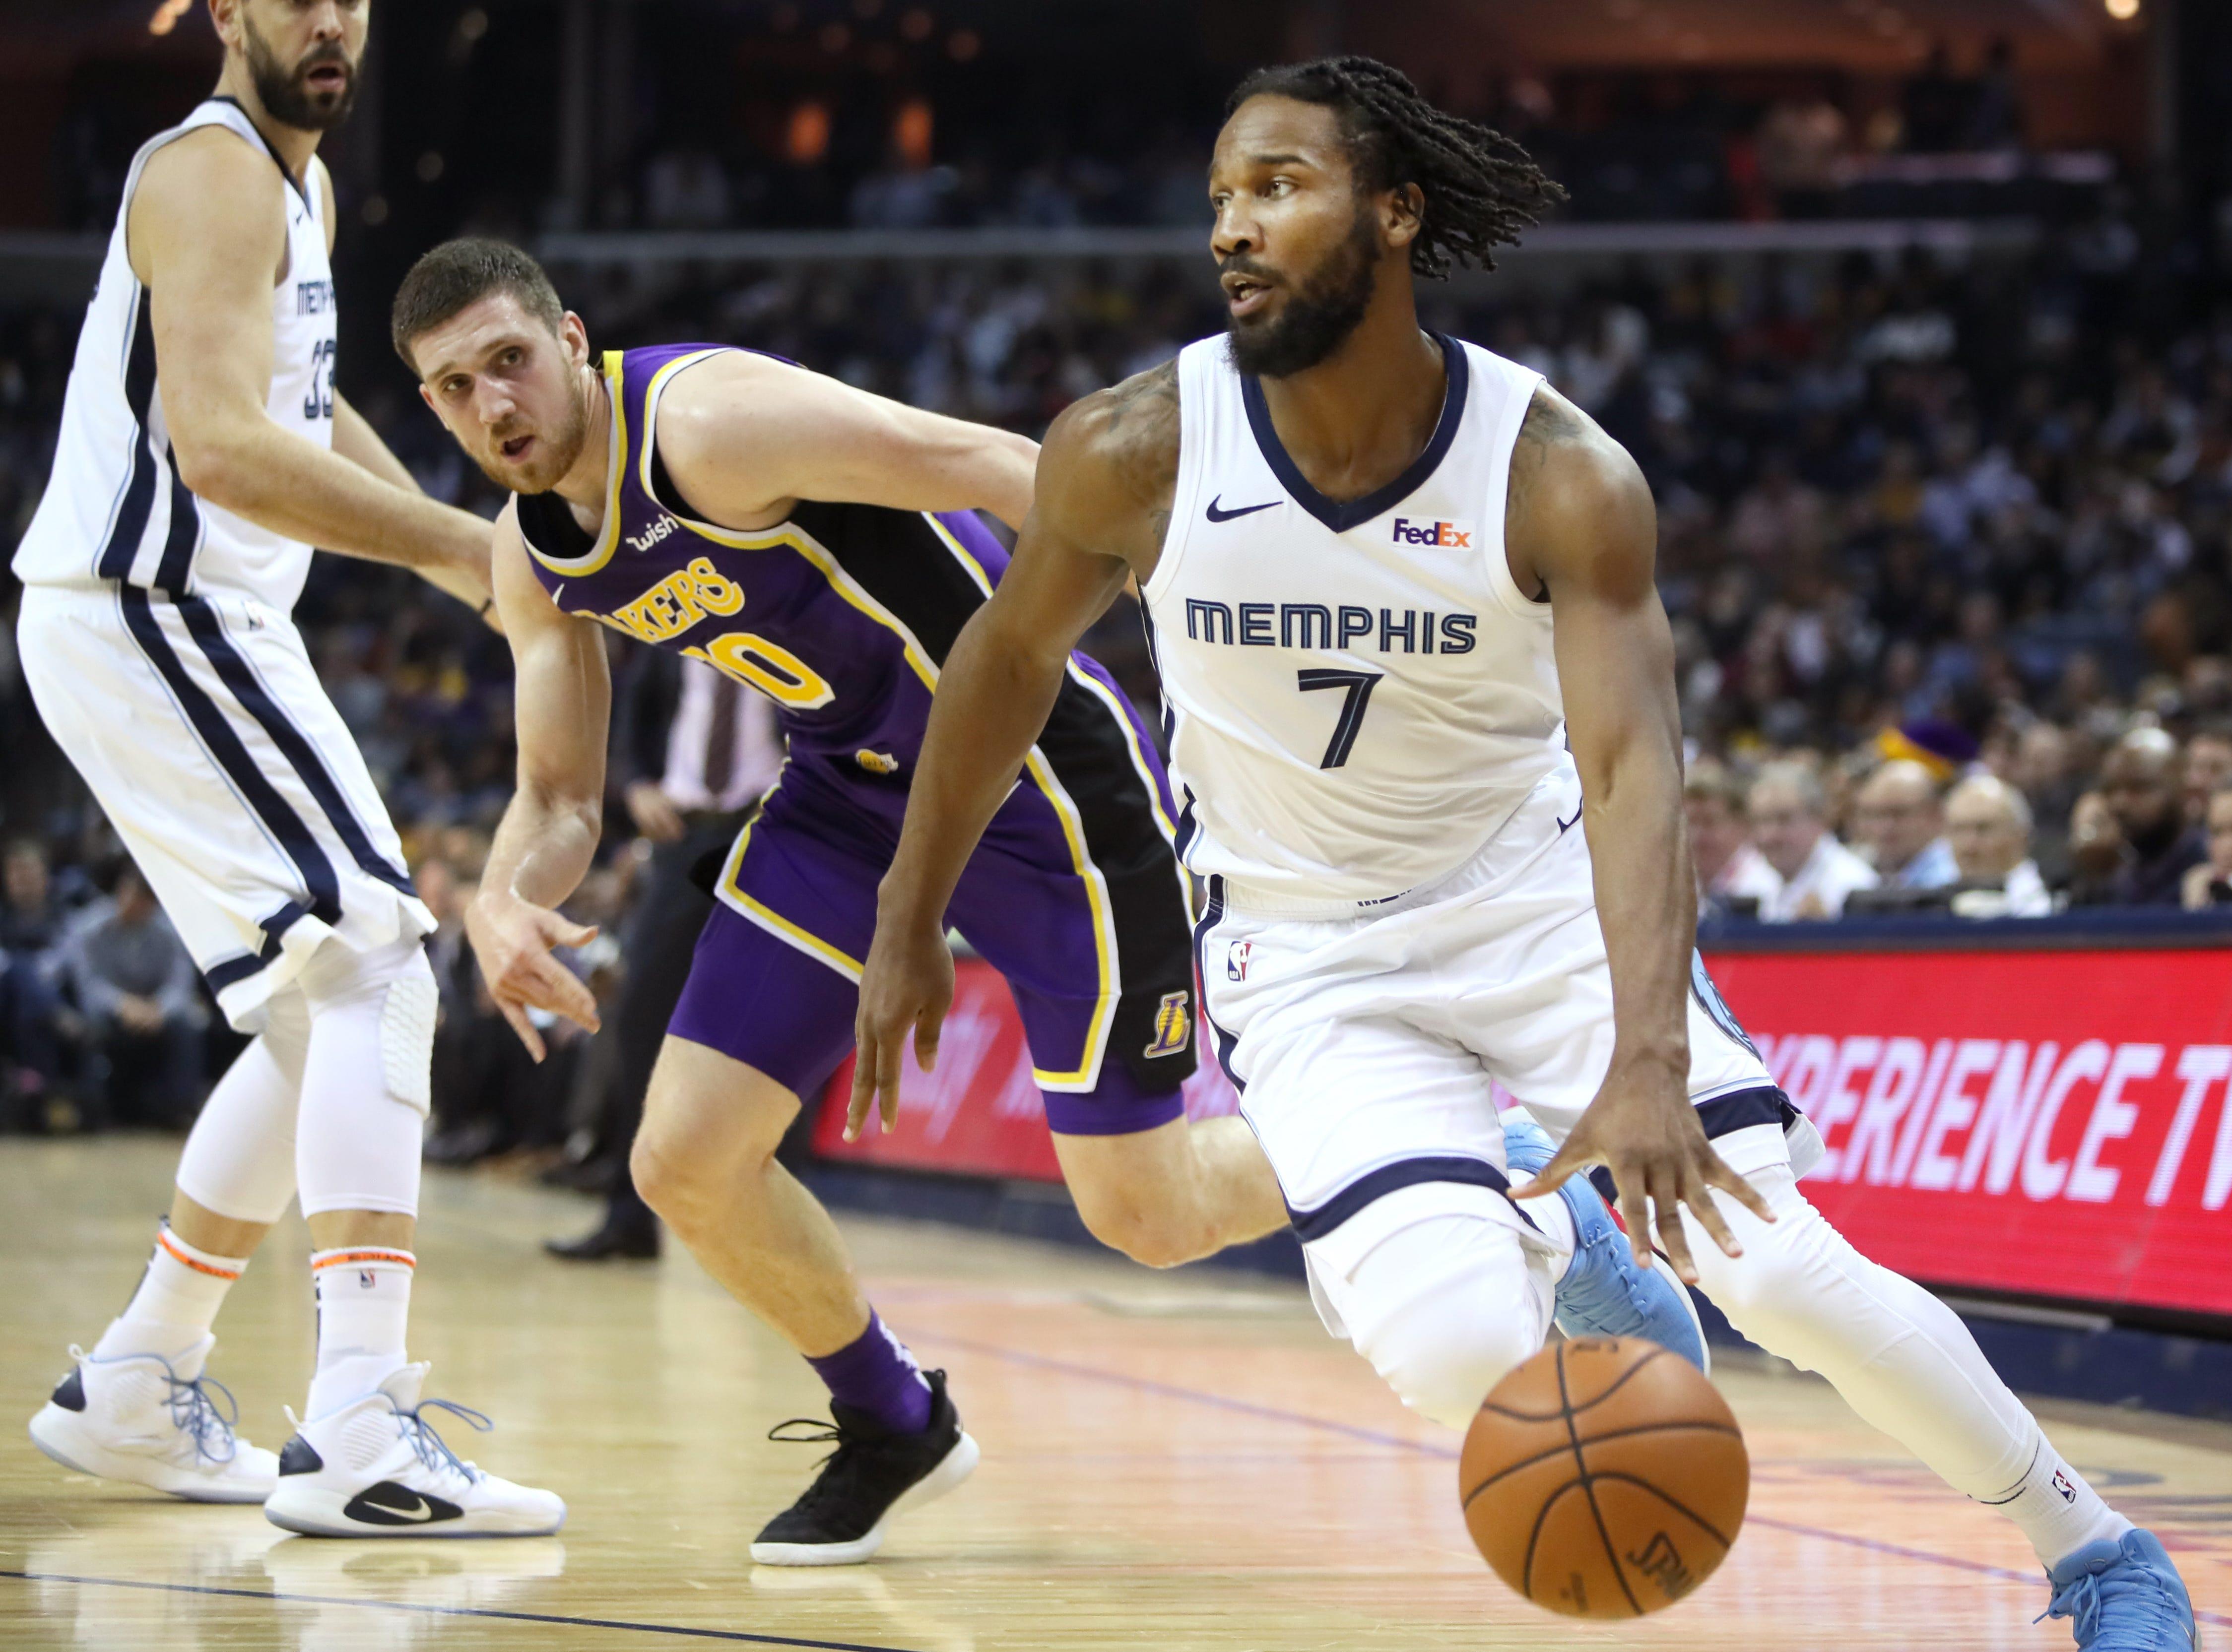 Memphis Grizzlies guard Wayne Selden drives past Los Angeles Lakers defender Sviatoslav Mykhailiuk at the FedExForum on Saturday, Dec. 6, 2018.